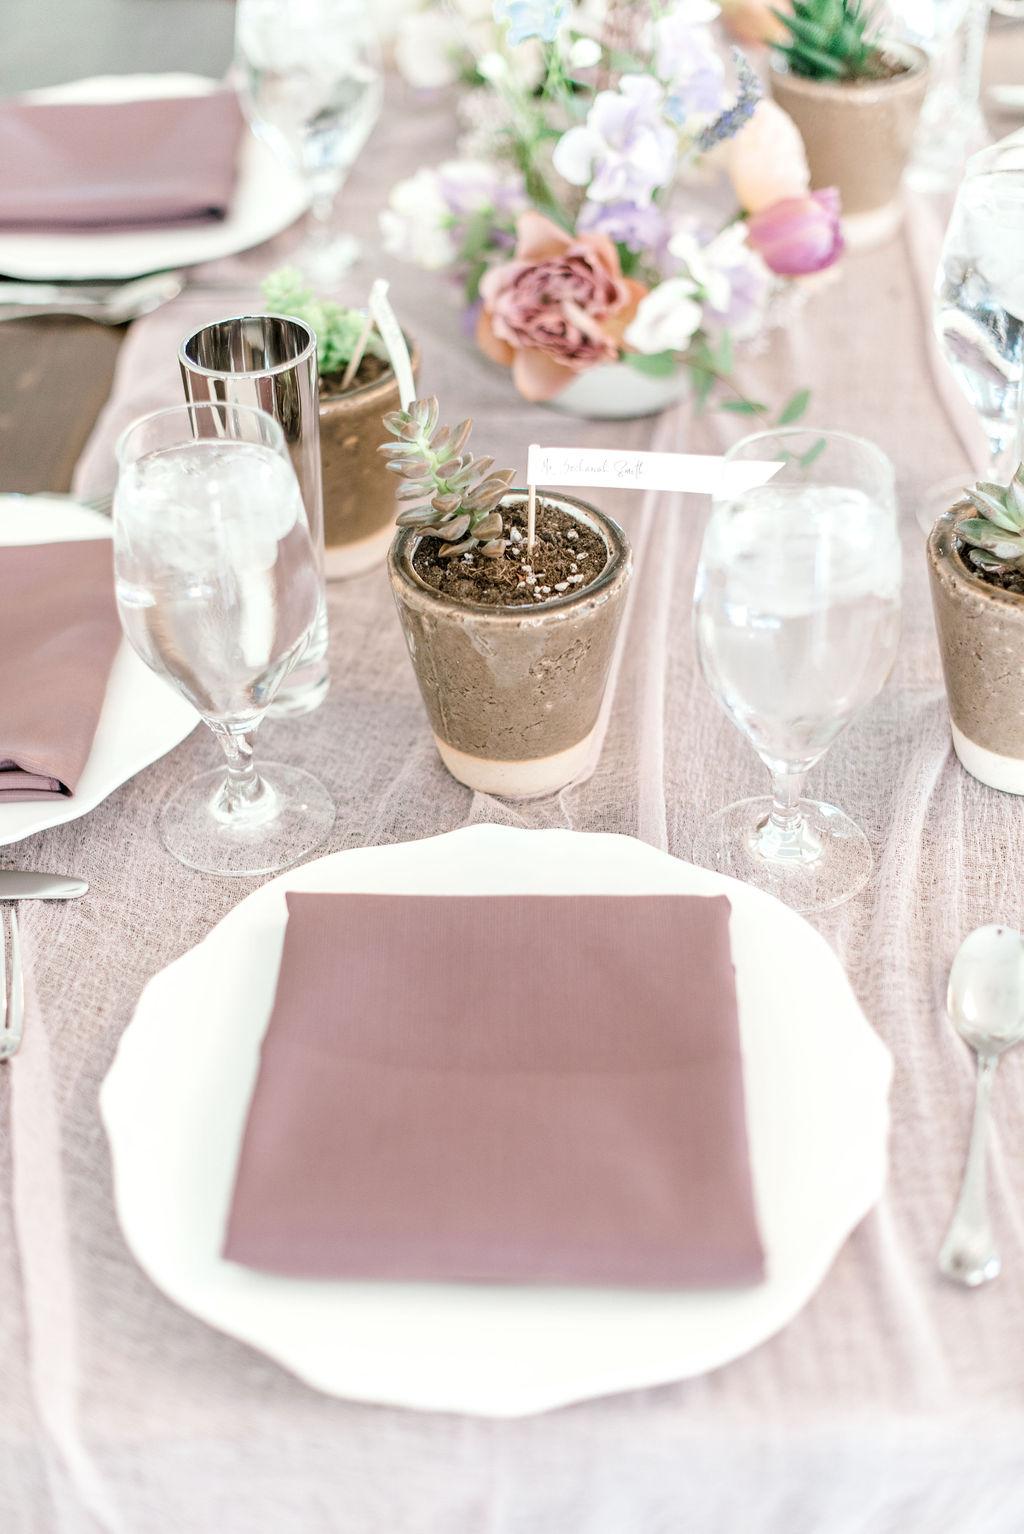 Dayton-event-planner-succulent-wedding-favors-seating